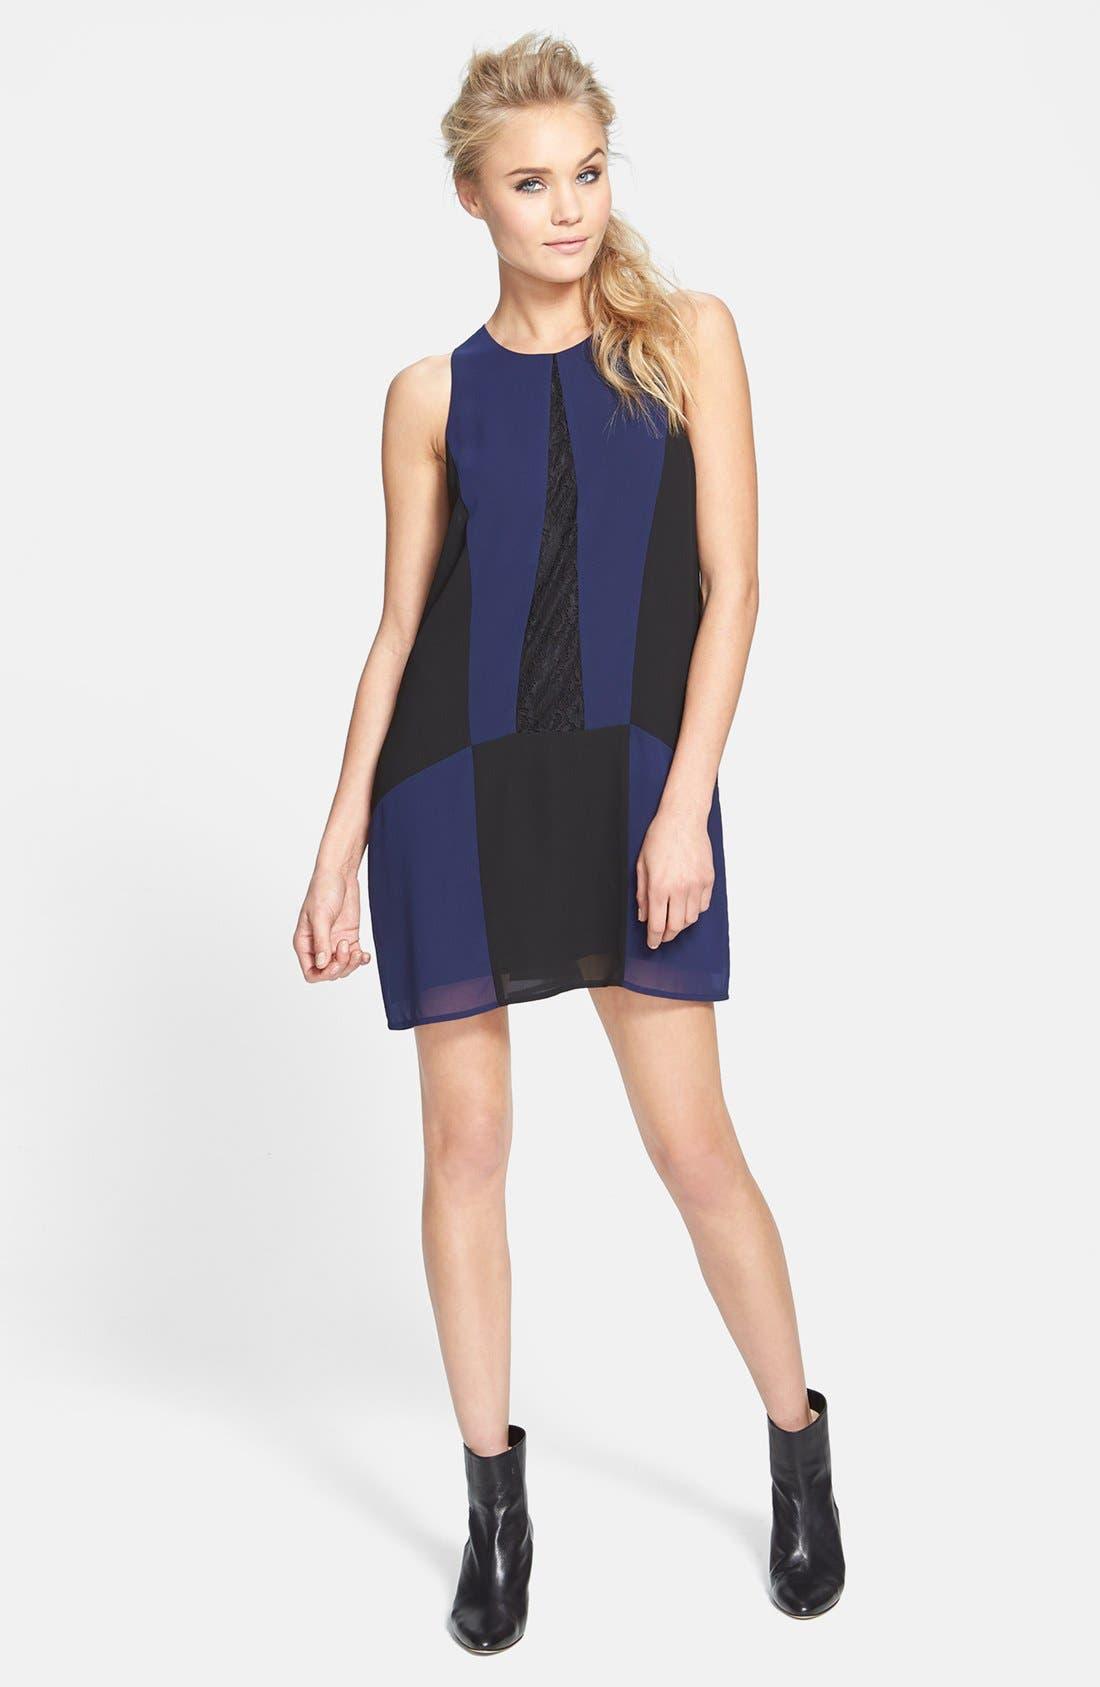 Alternate Image 1 Selected - ASTR Colorblock Lace & Chiffon Shift Dress